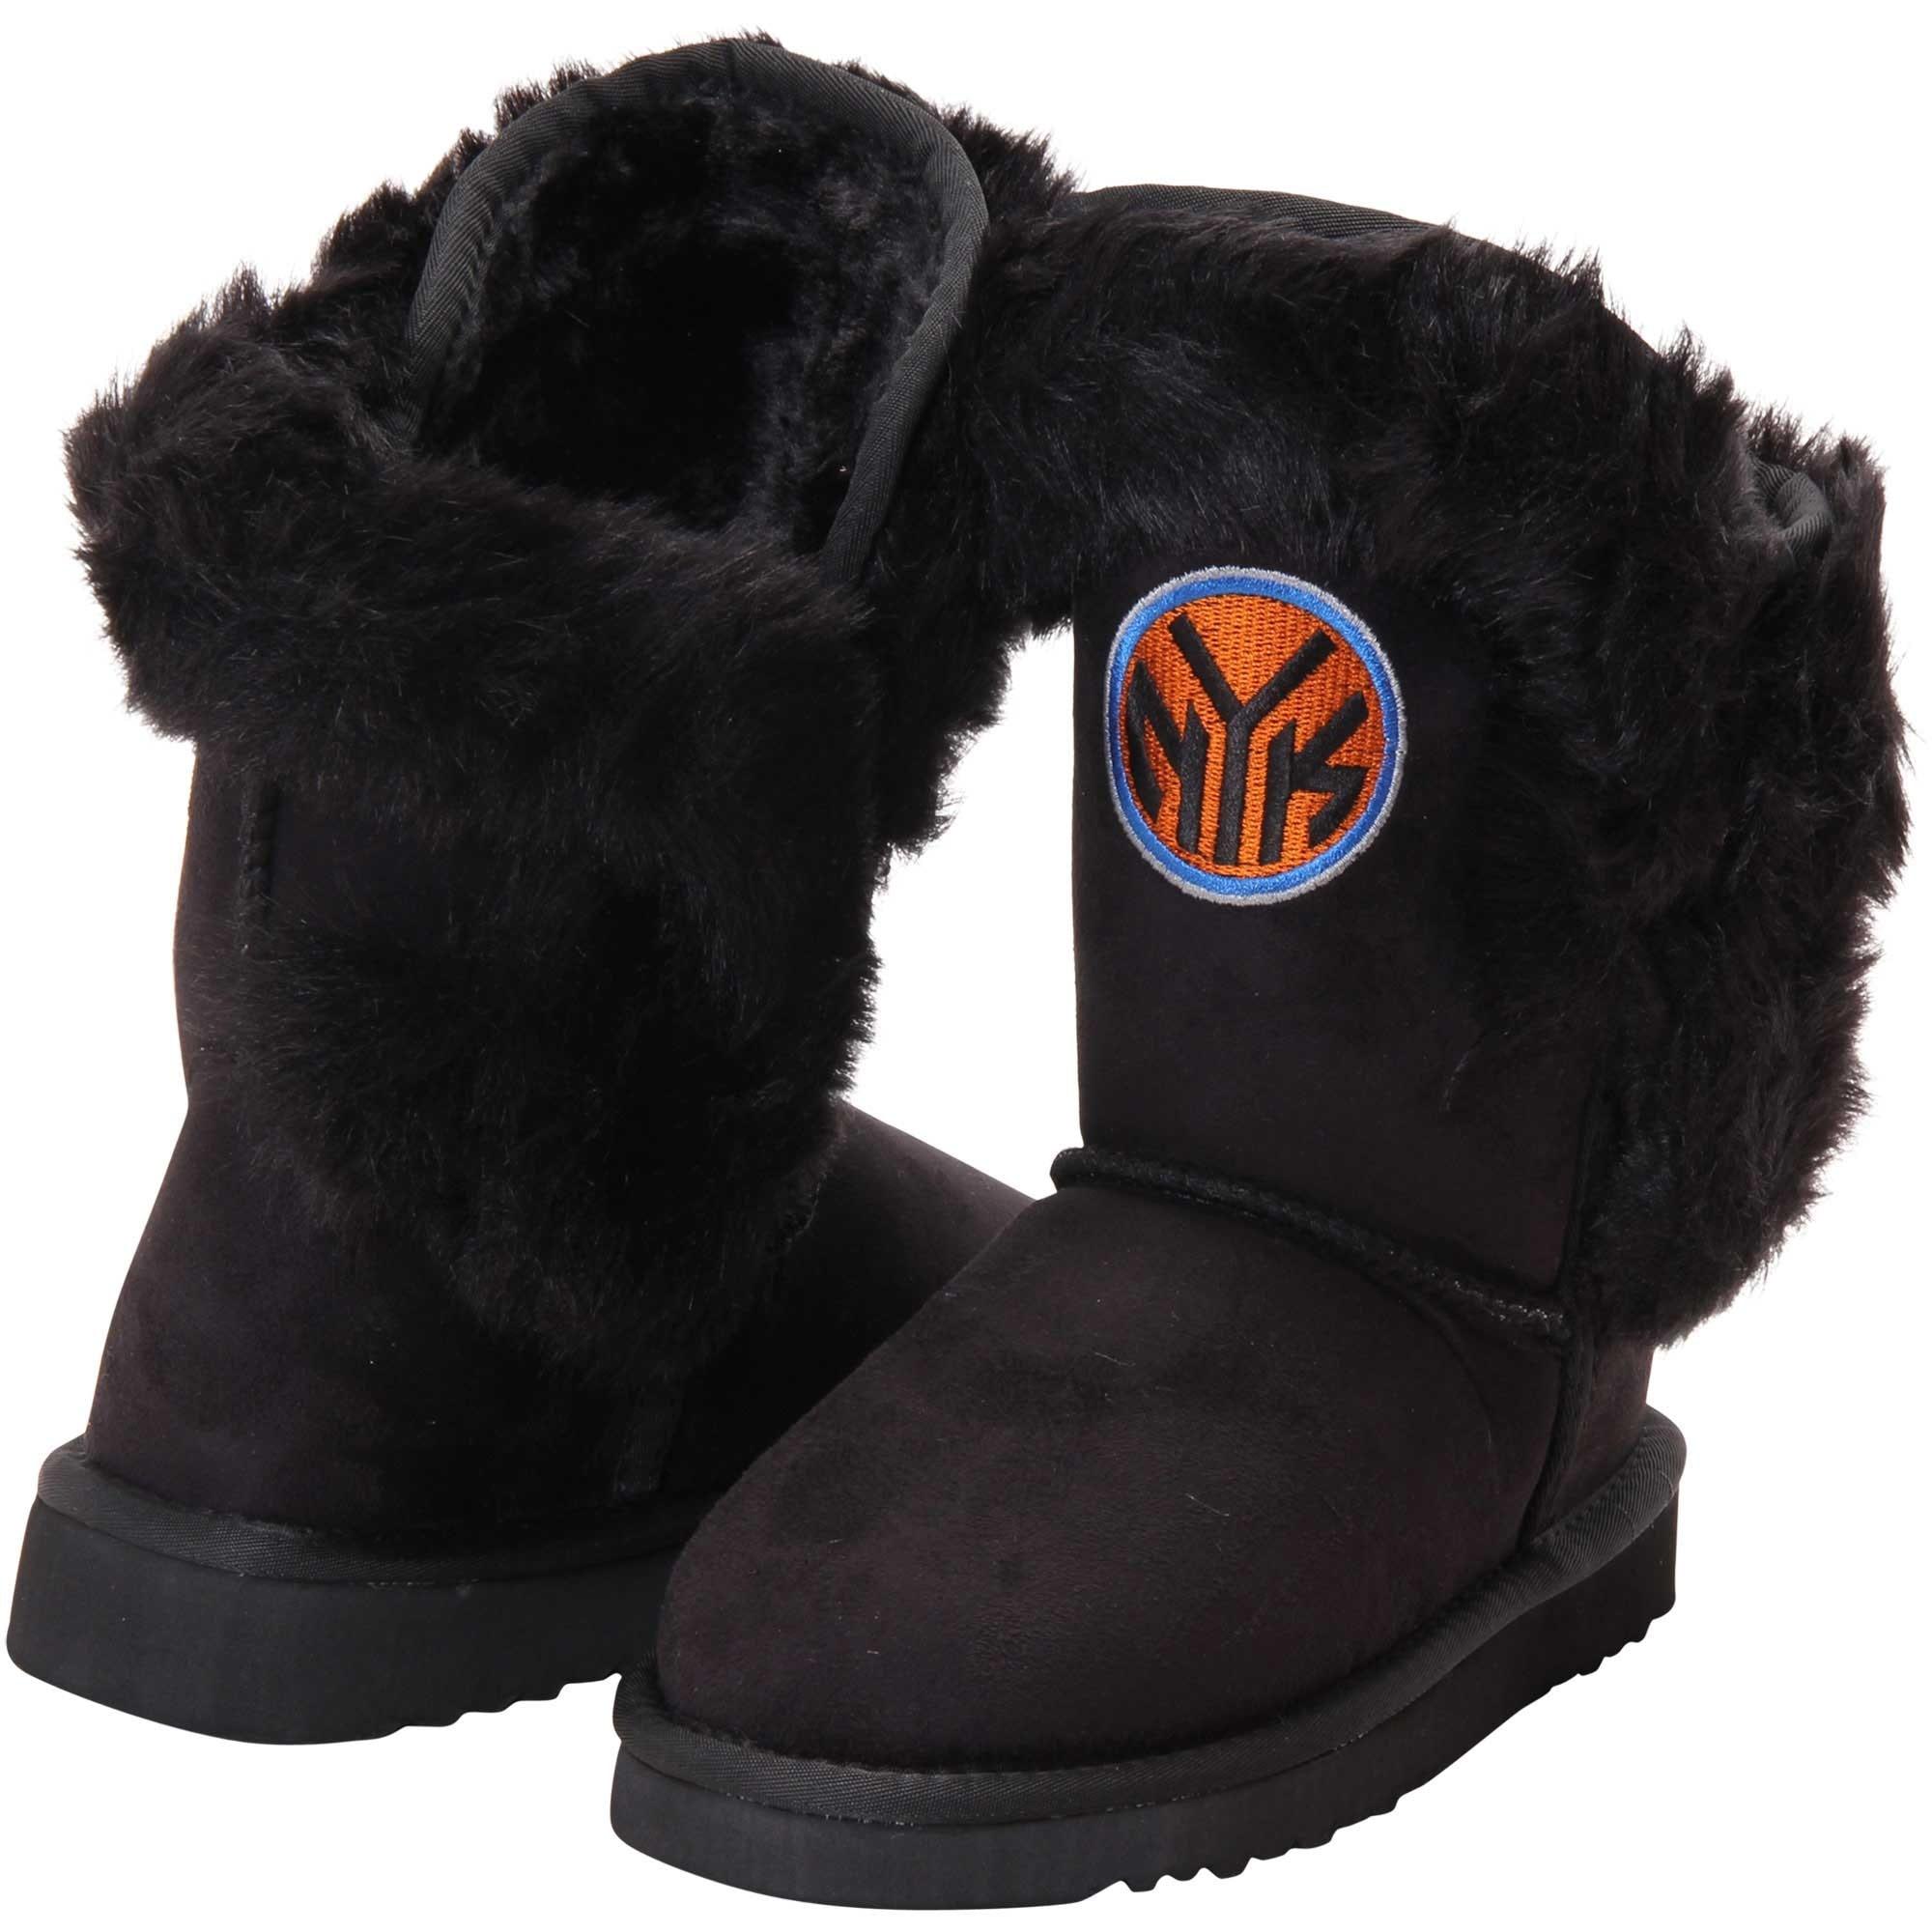 New York Knicks Girls Youth Mini Champions Boots